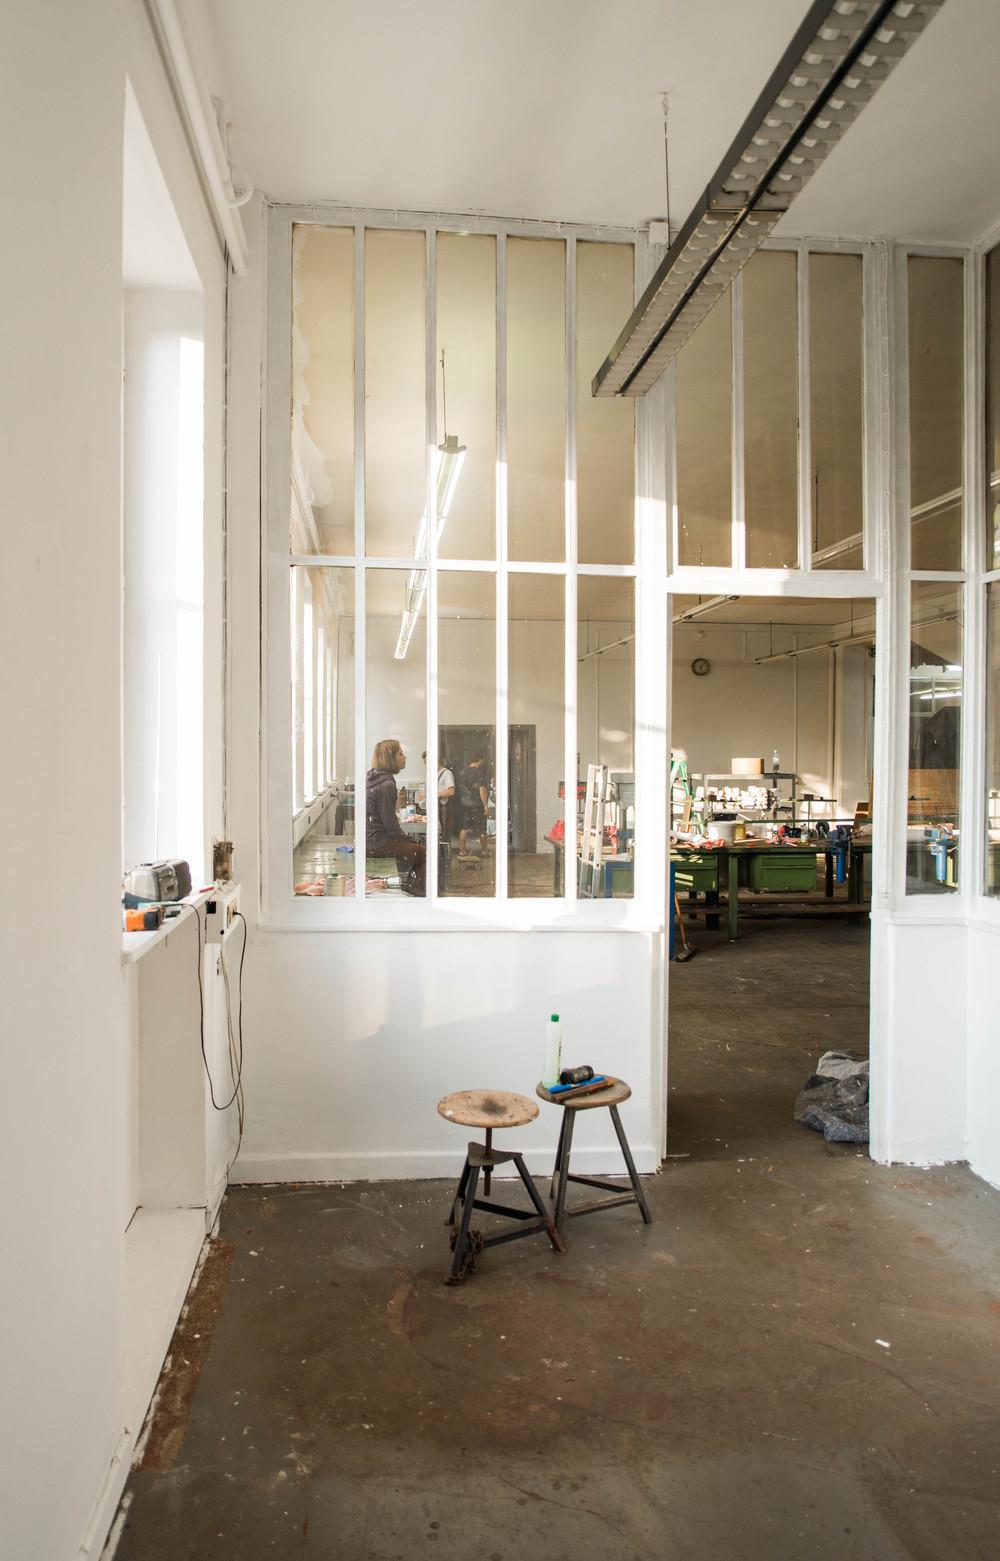 Studio_Renovierung-10.jpg